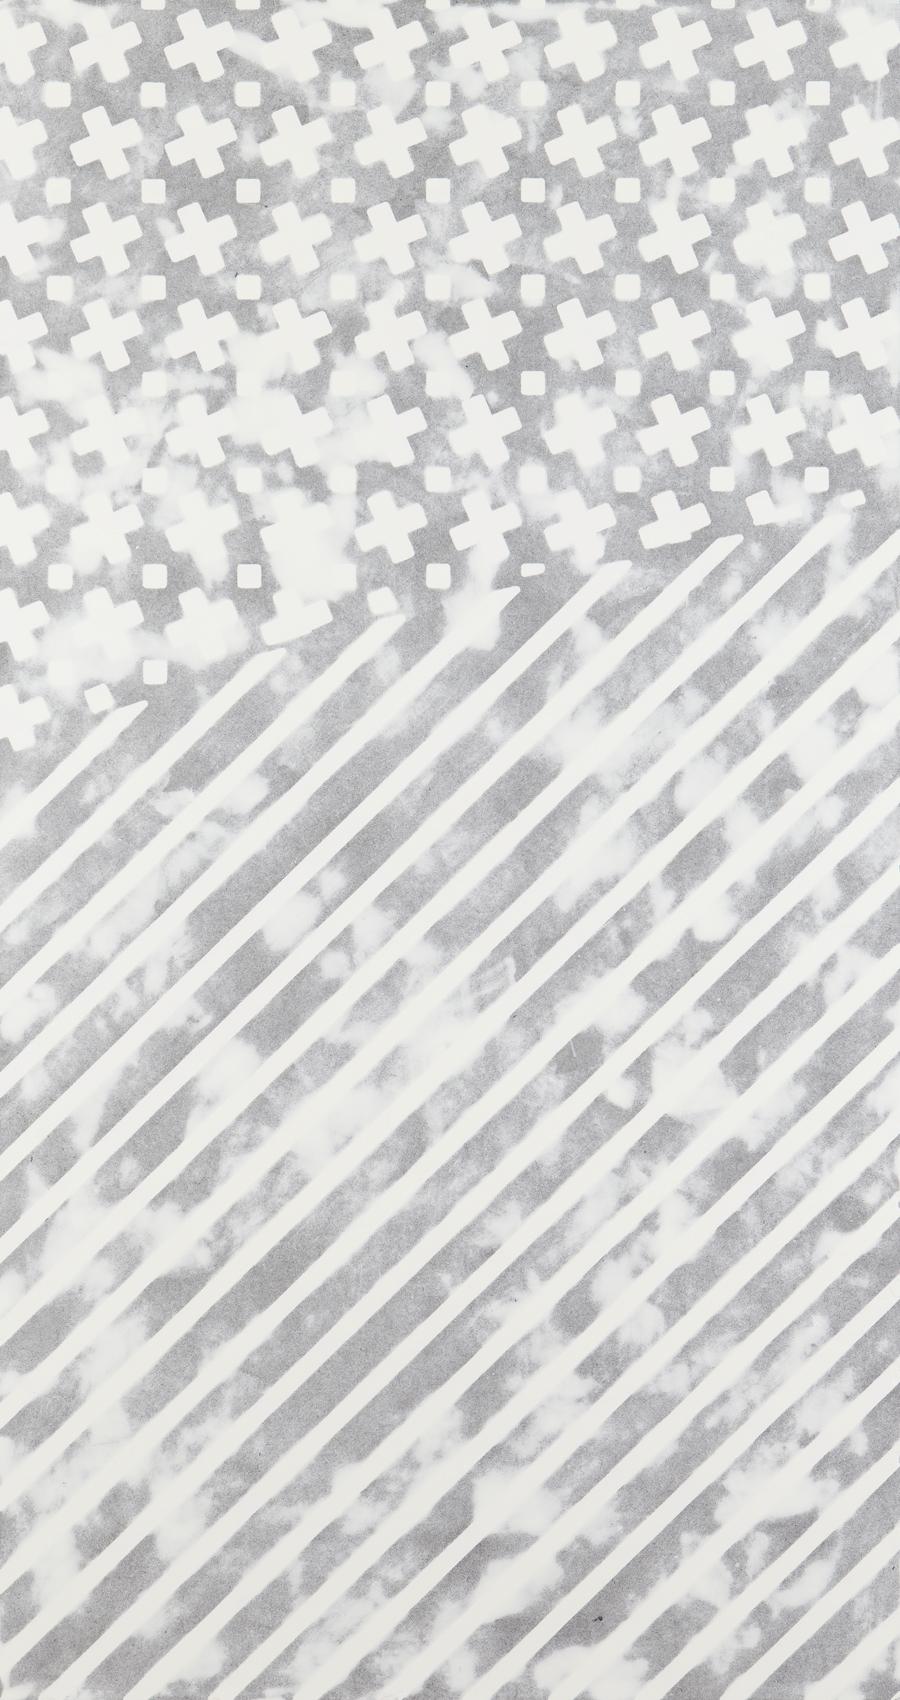 Untitled, 2016, Plaster on MDF, 150x80 cm (4).jpg